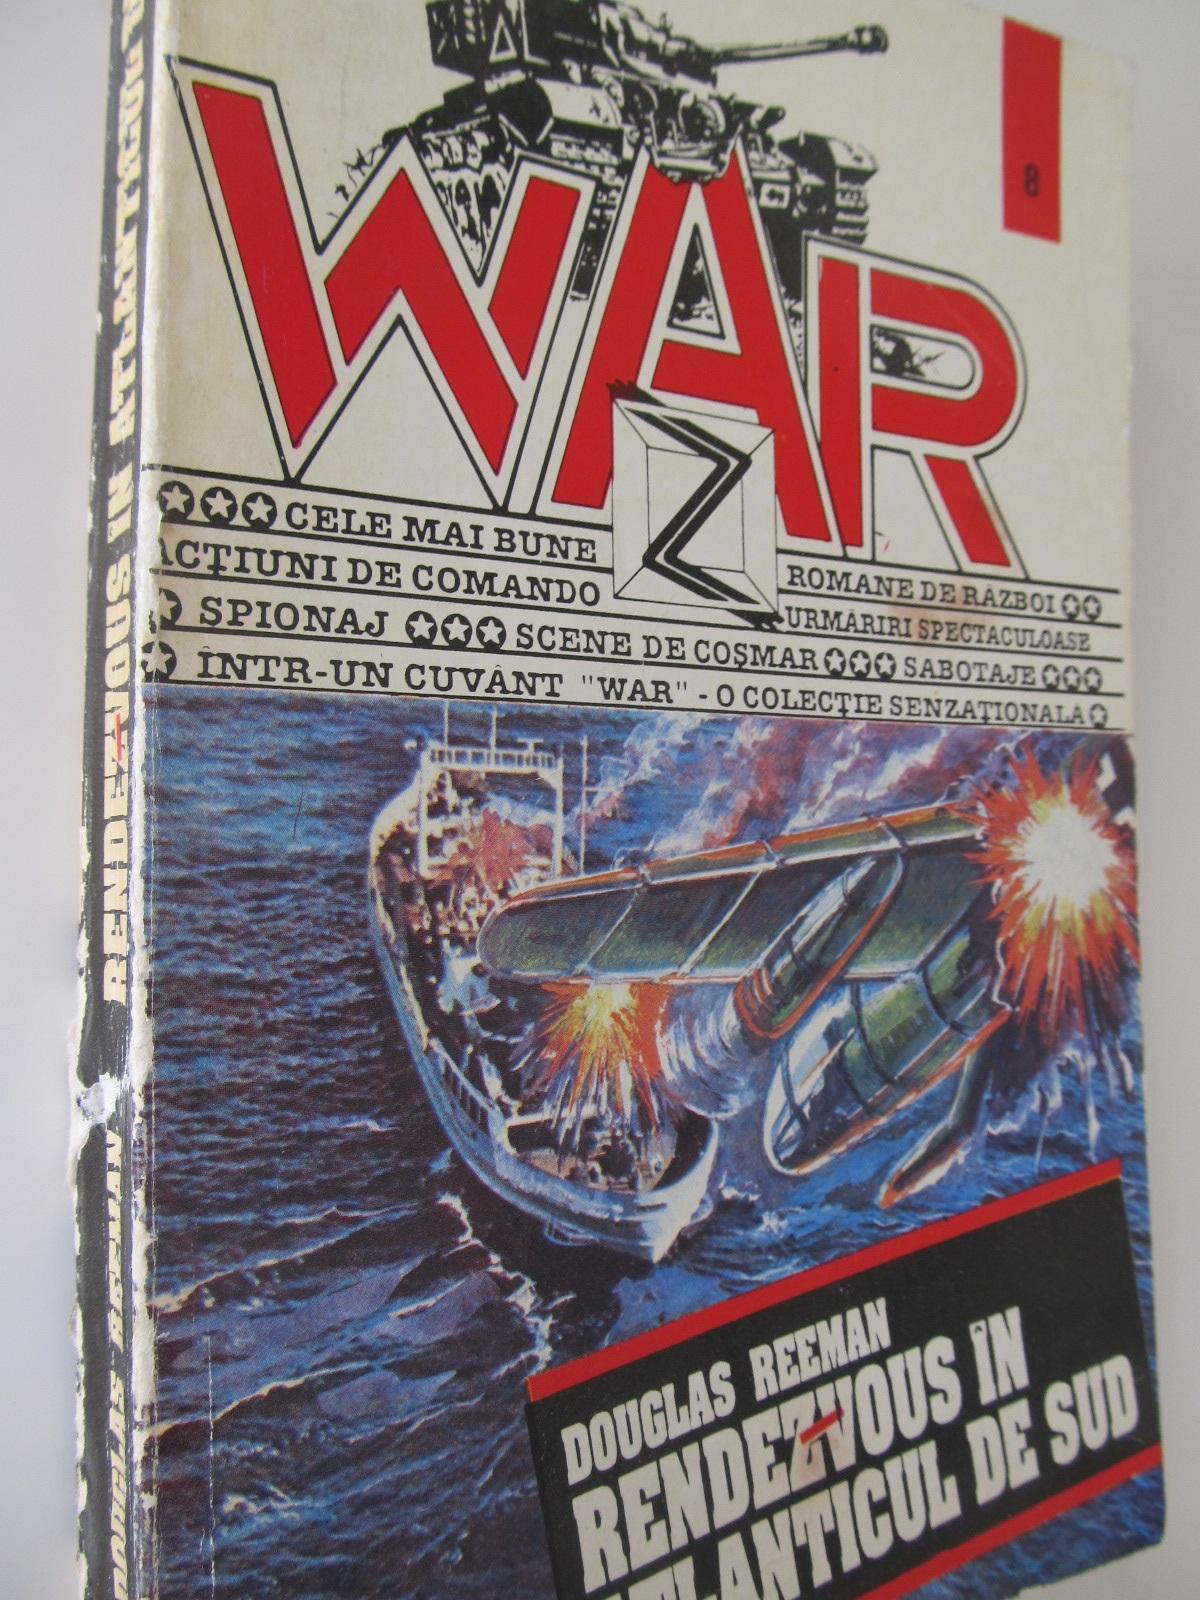 Randezvous in atlanticul de sud - Douglas Reeman | Detalii carte